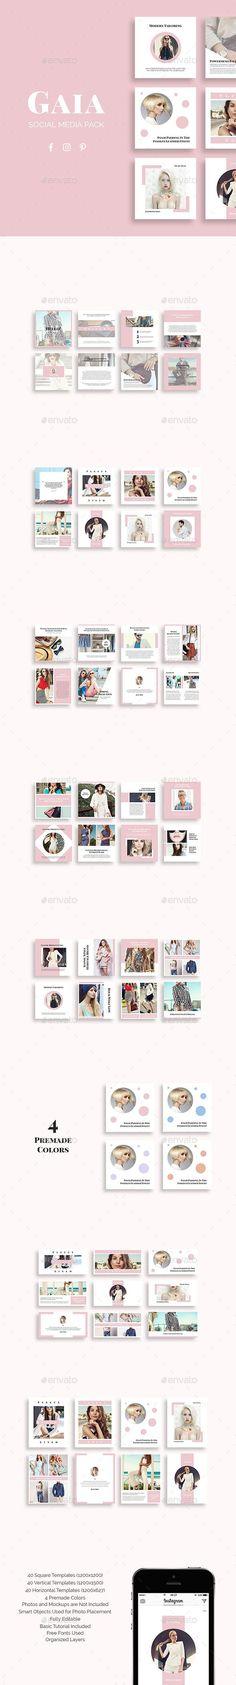 Gaia Social Media Pack — Photoshop PSD #commerce #accessories Social Media Branding, Social Media Banner, Social Media Template, Social Media Design, Layout Design, Banner Design, Photoshop, Portfolio Design, Banner Instagram